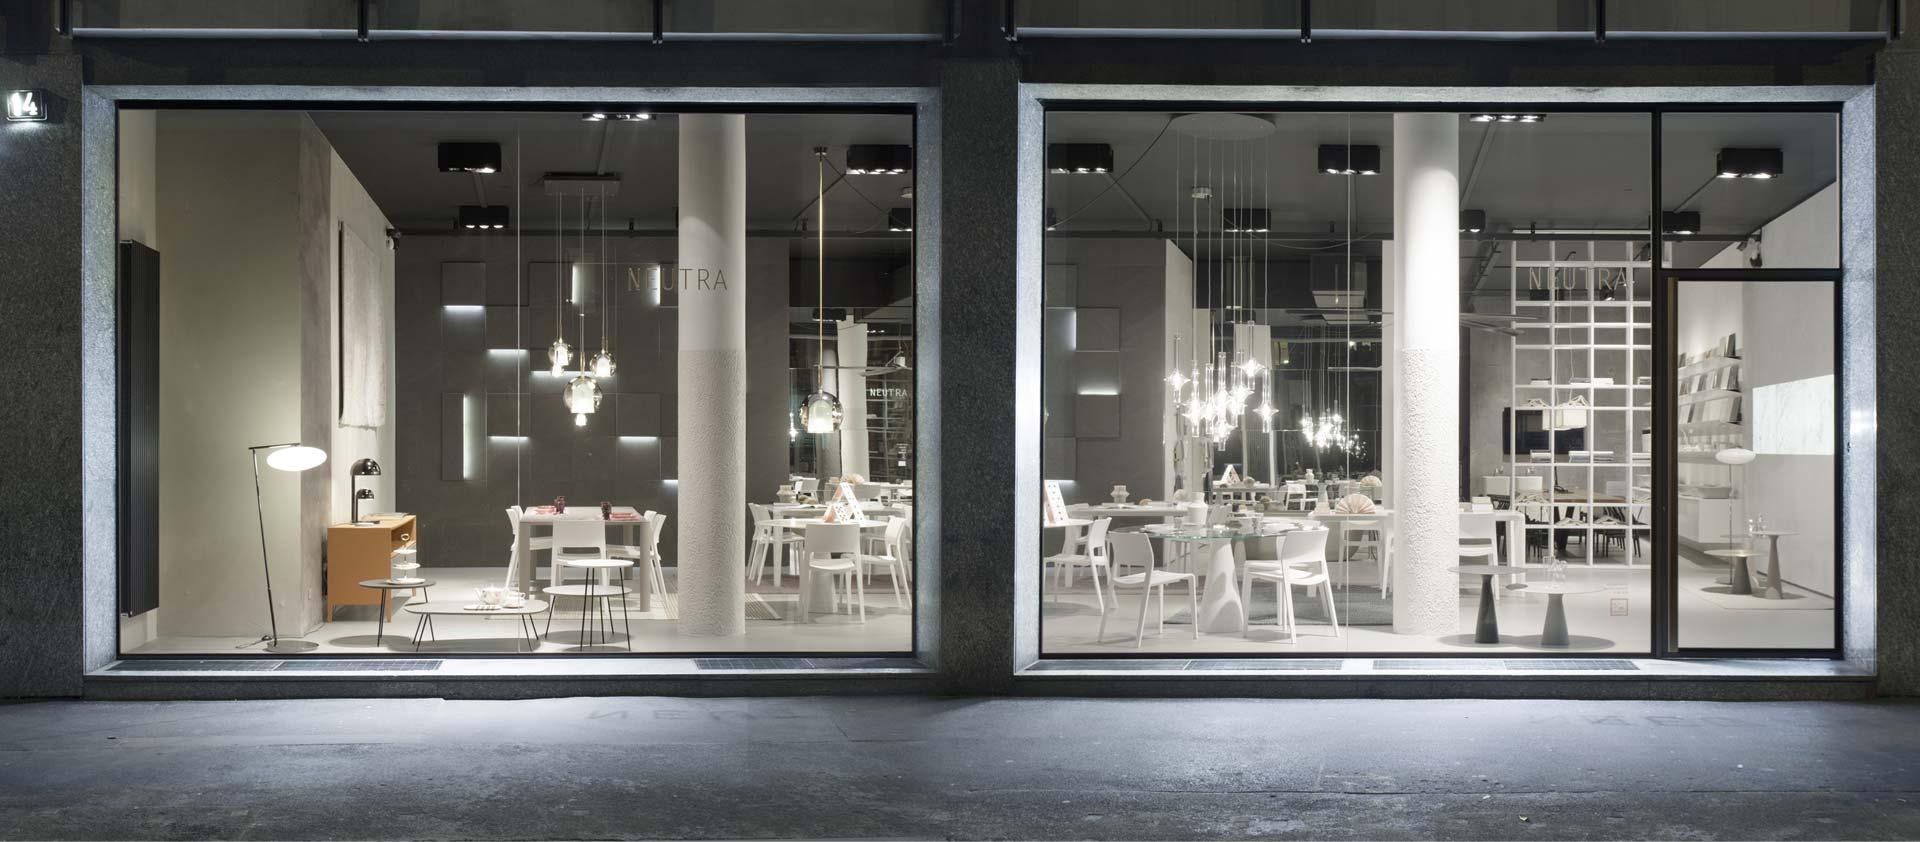 Neutra Flagship store 2015